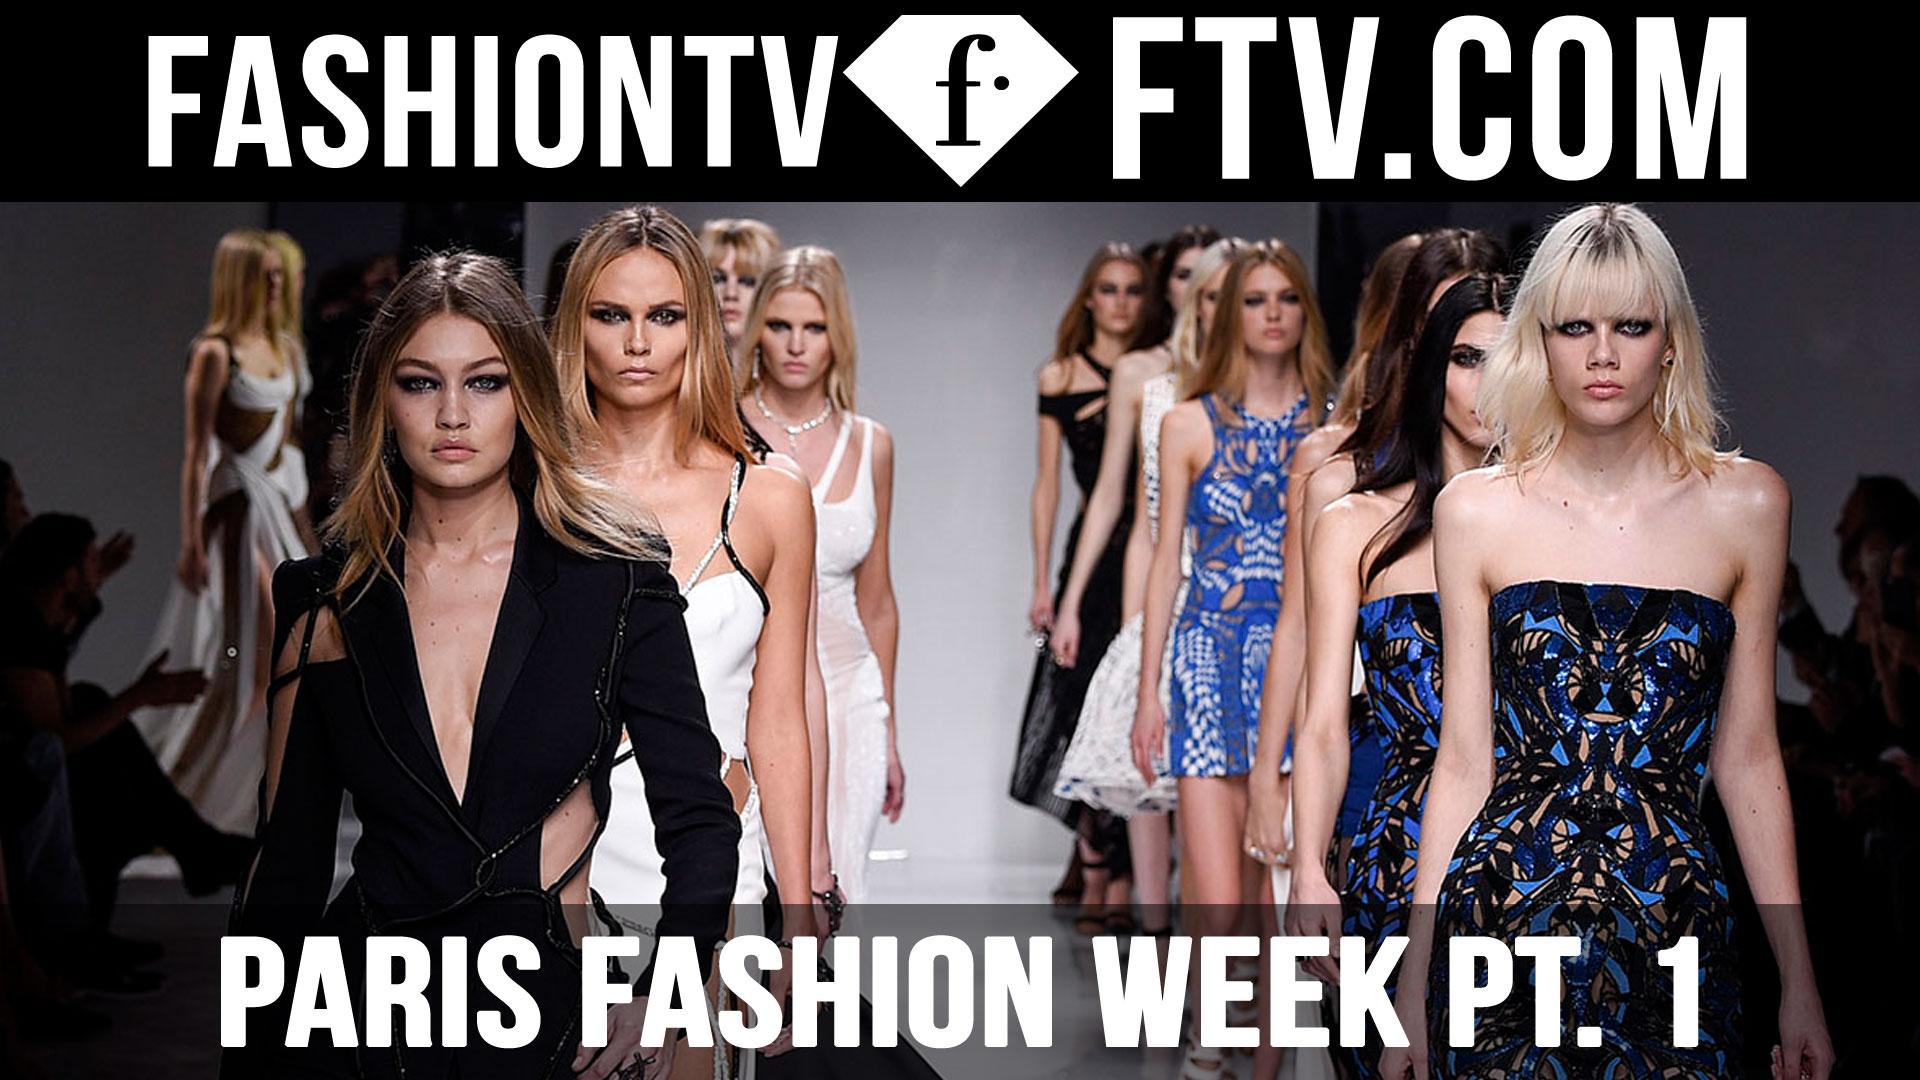 Paris Fashion Week Fall/Winter 2016-17 pt. 1   FTV.com